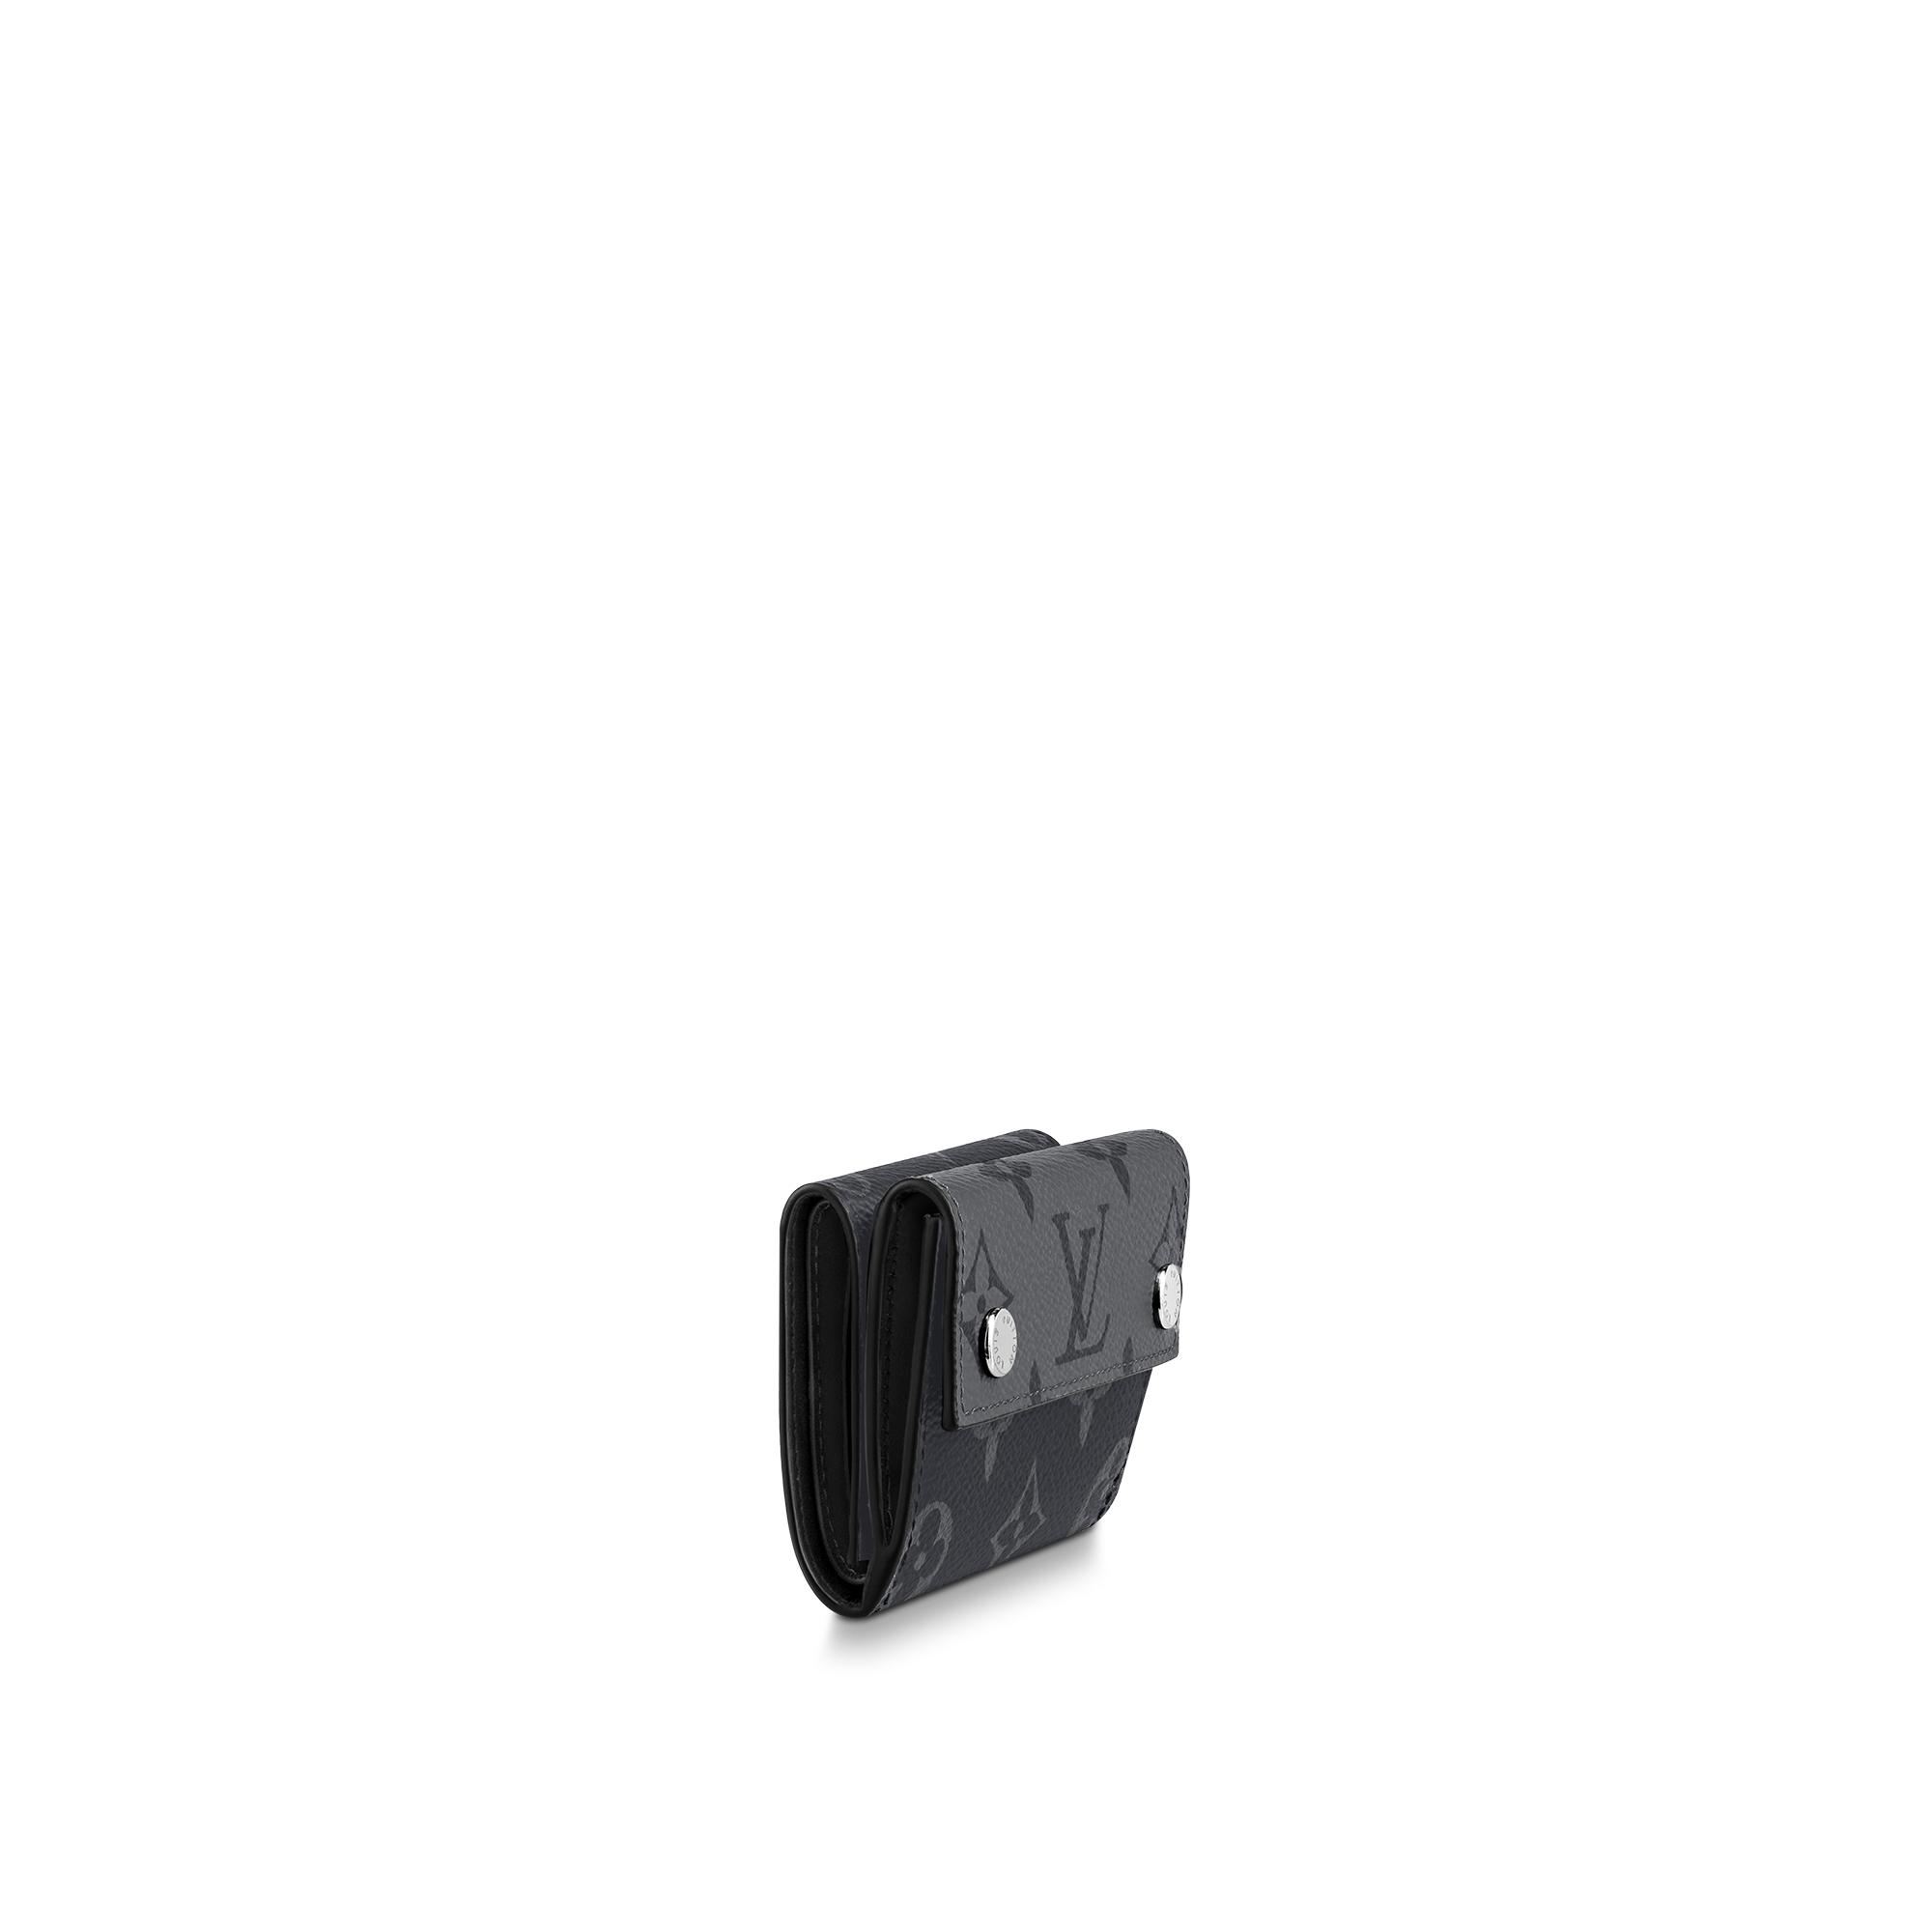 LV M45417 Eclipse Reverse Discovery 短款钱夹